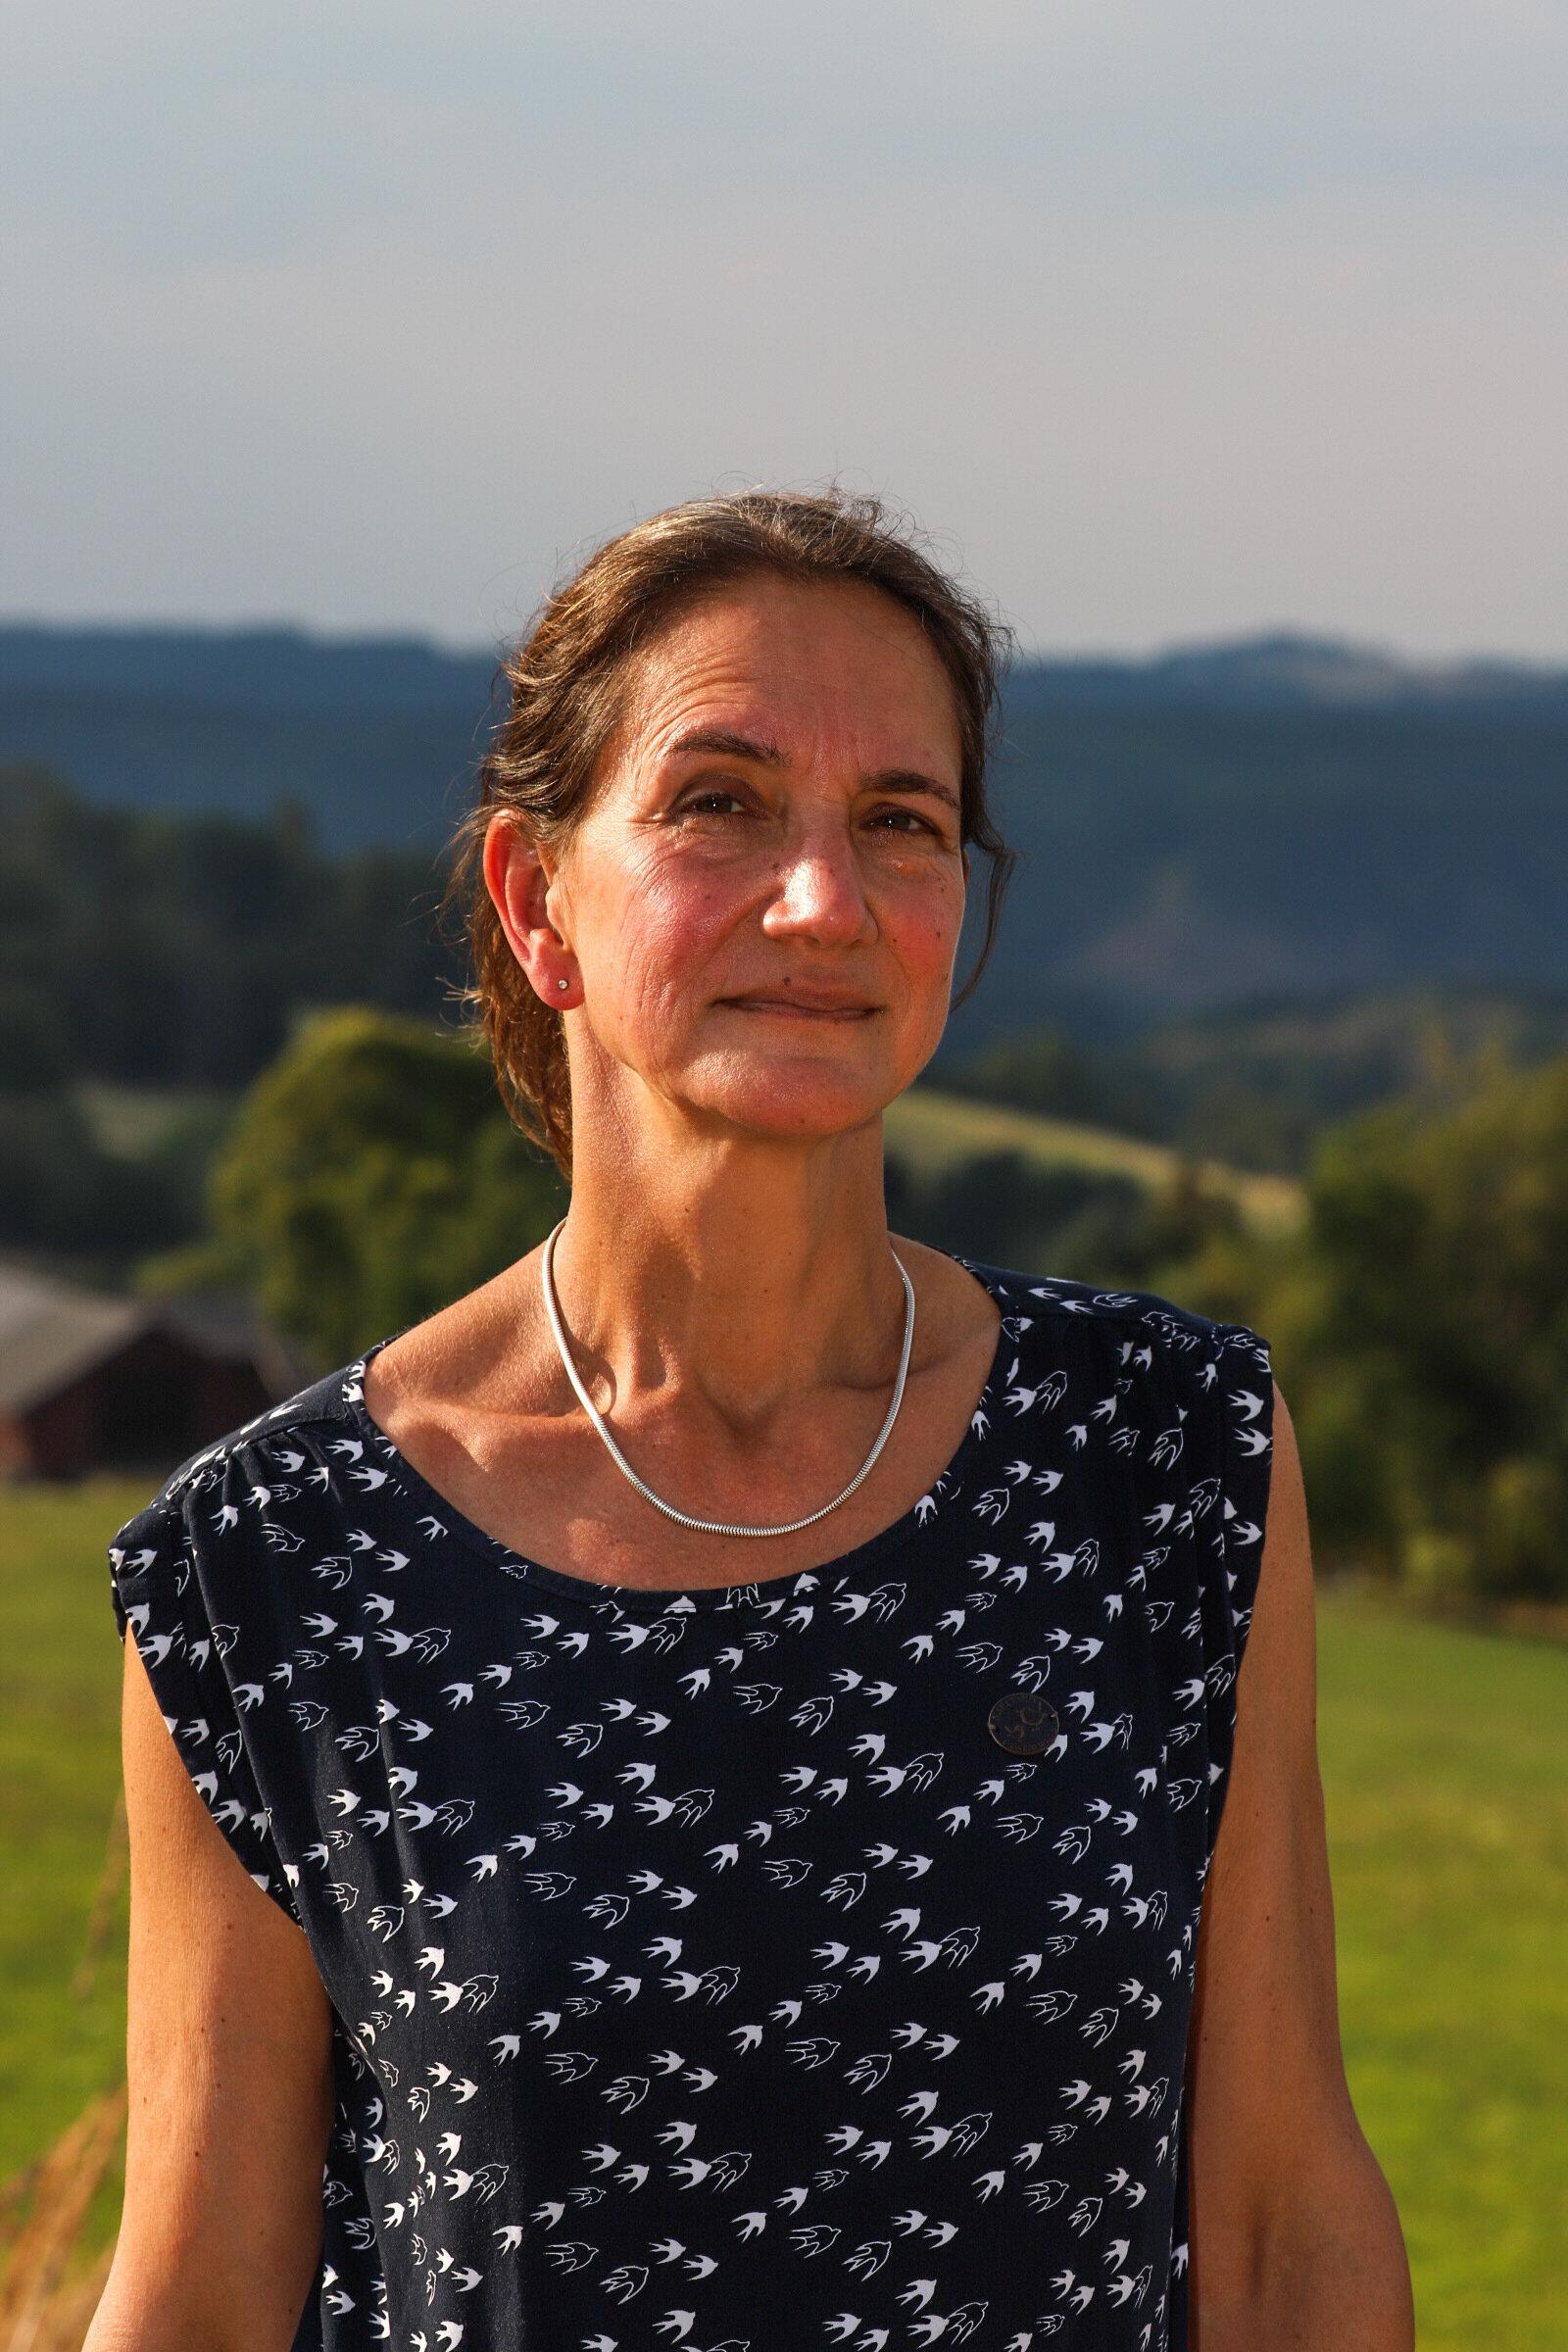 Annette Lewandowsky